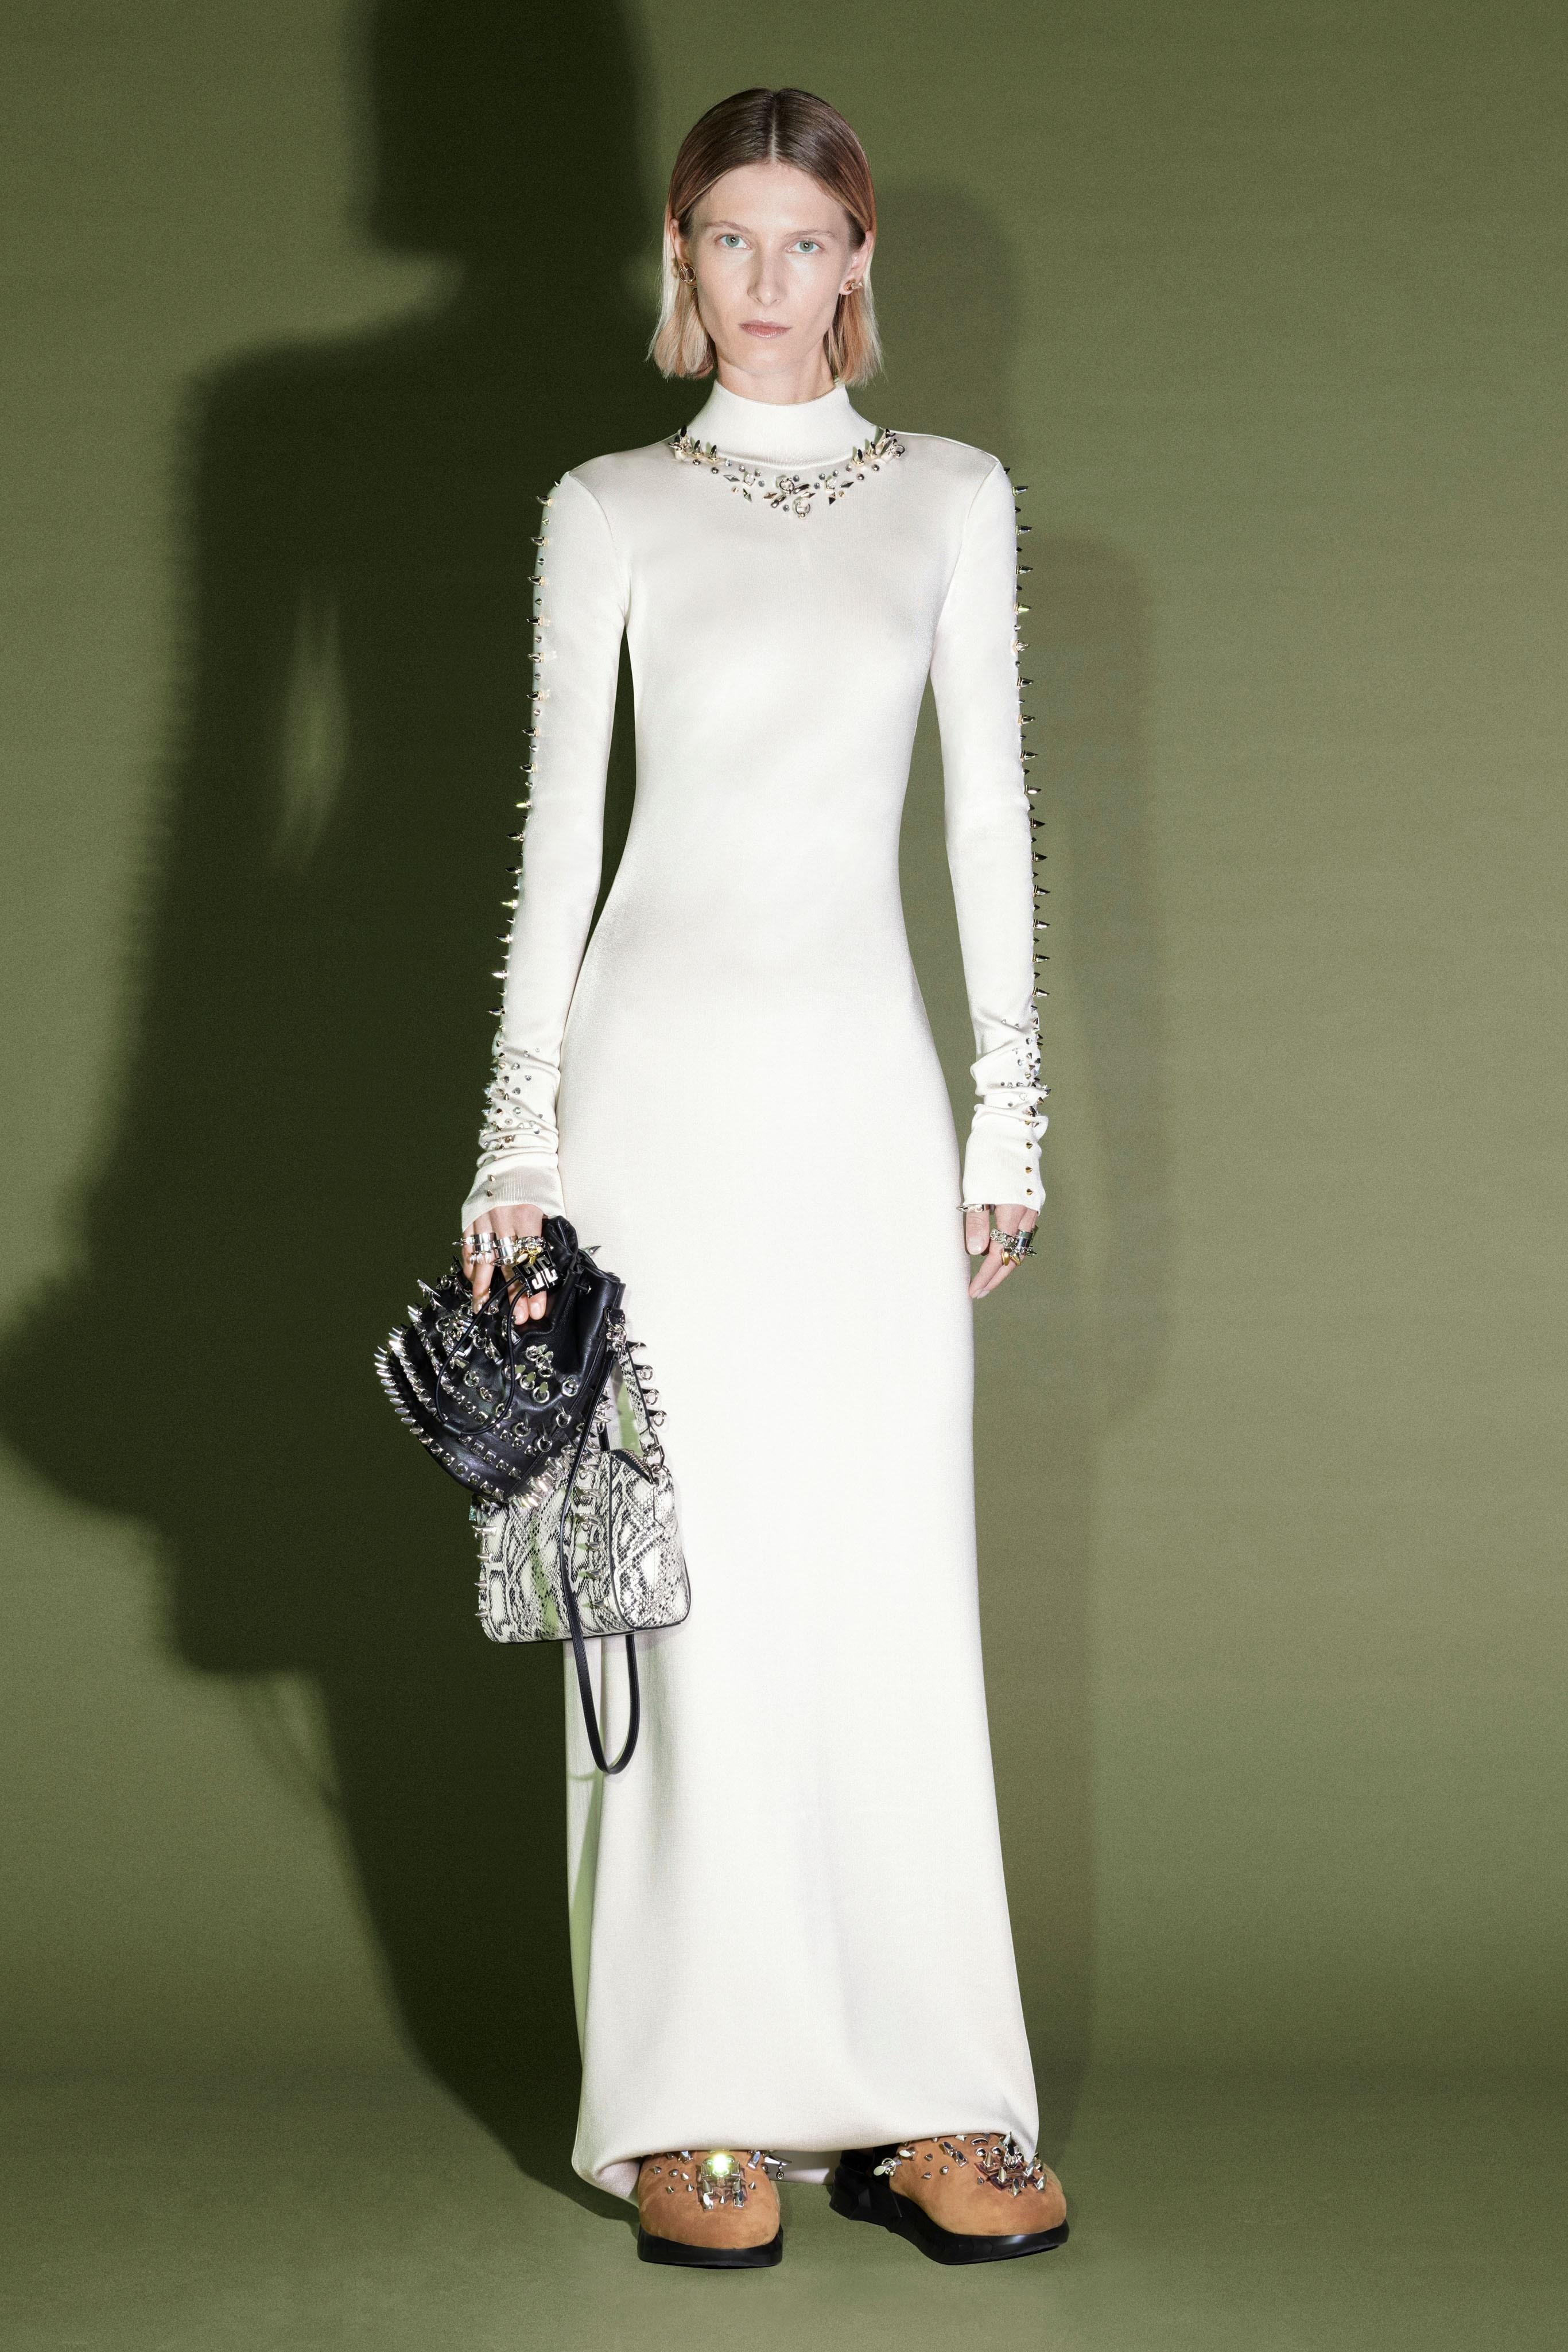 00035-Givenchy-Pre-Fall-21